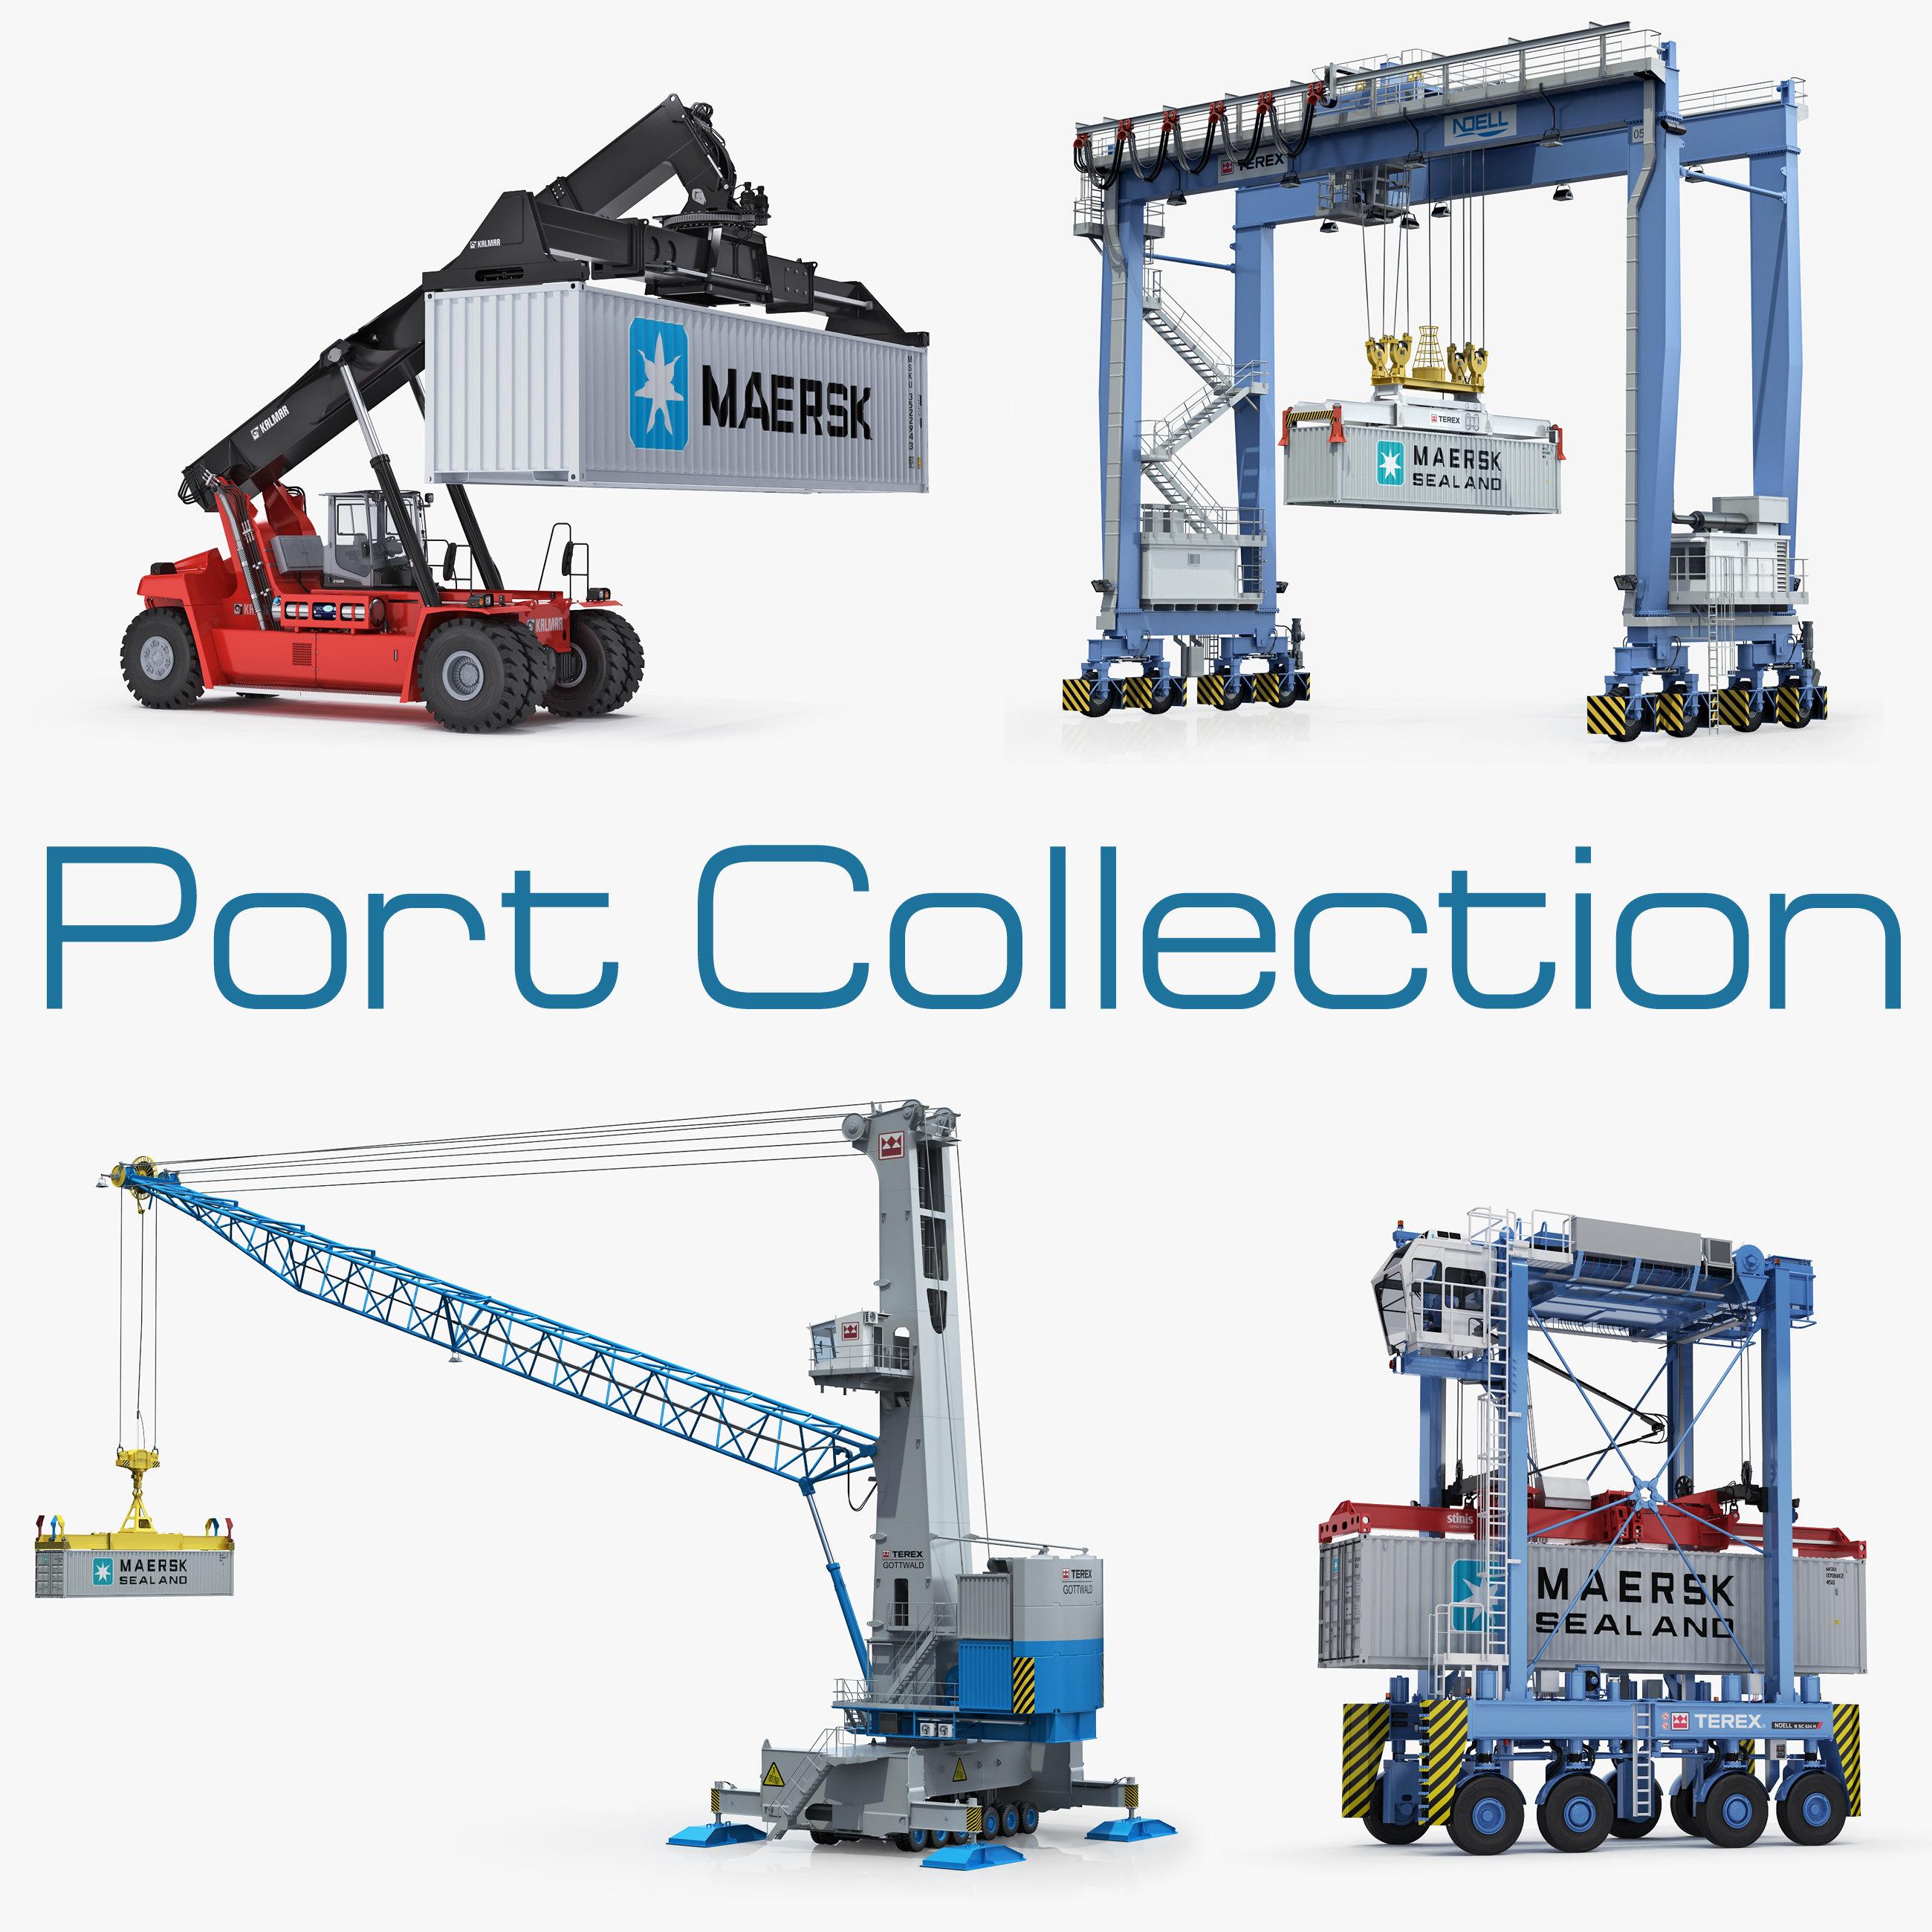 Collection_Port_Equipment.jpg